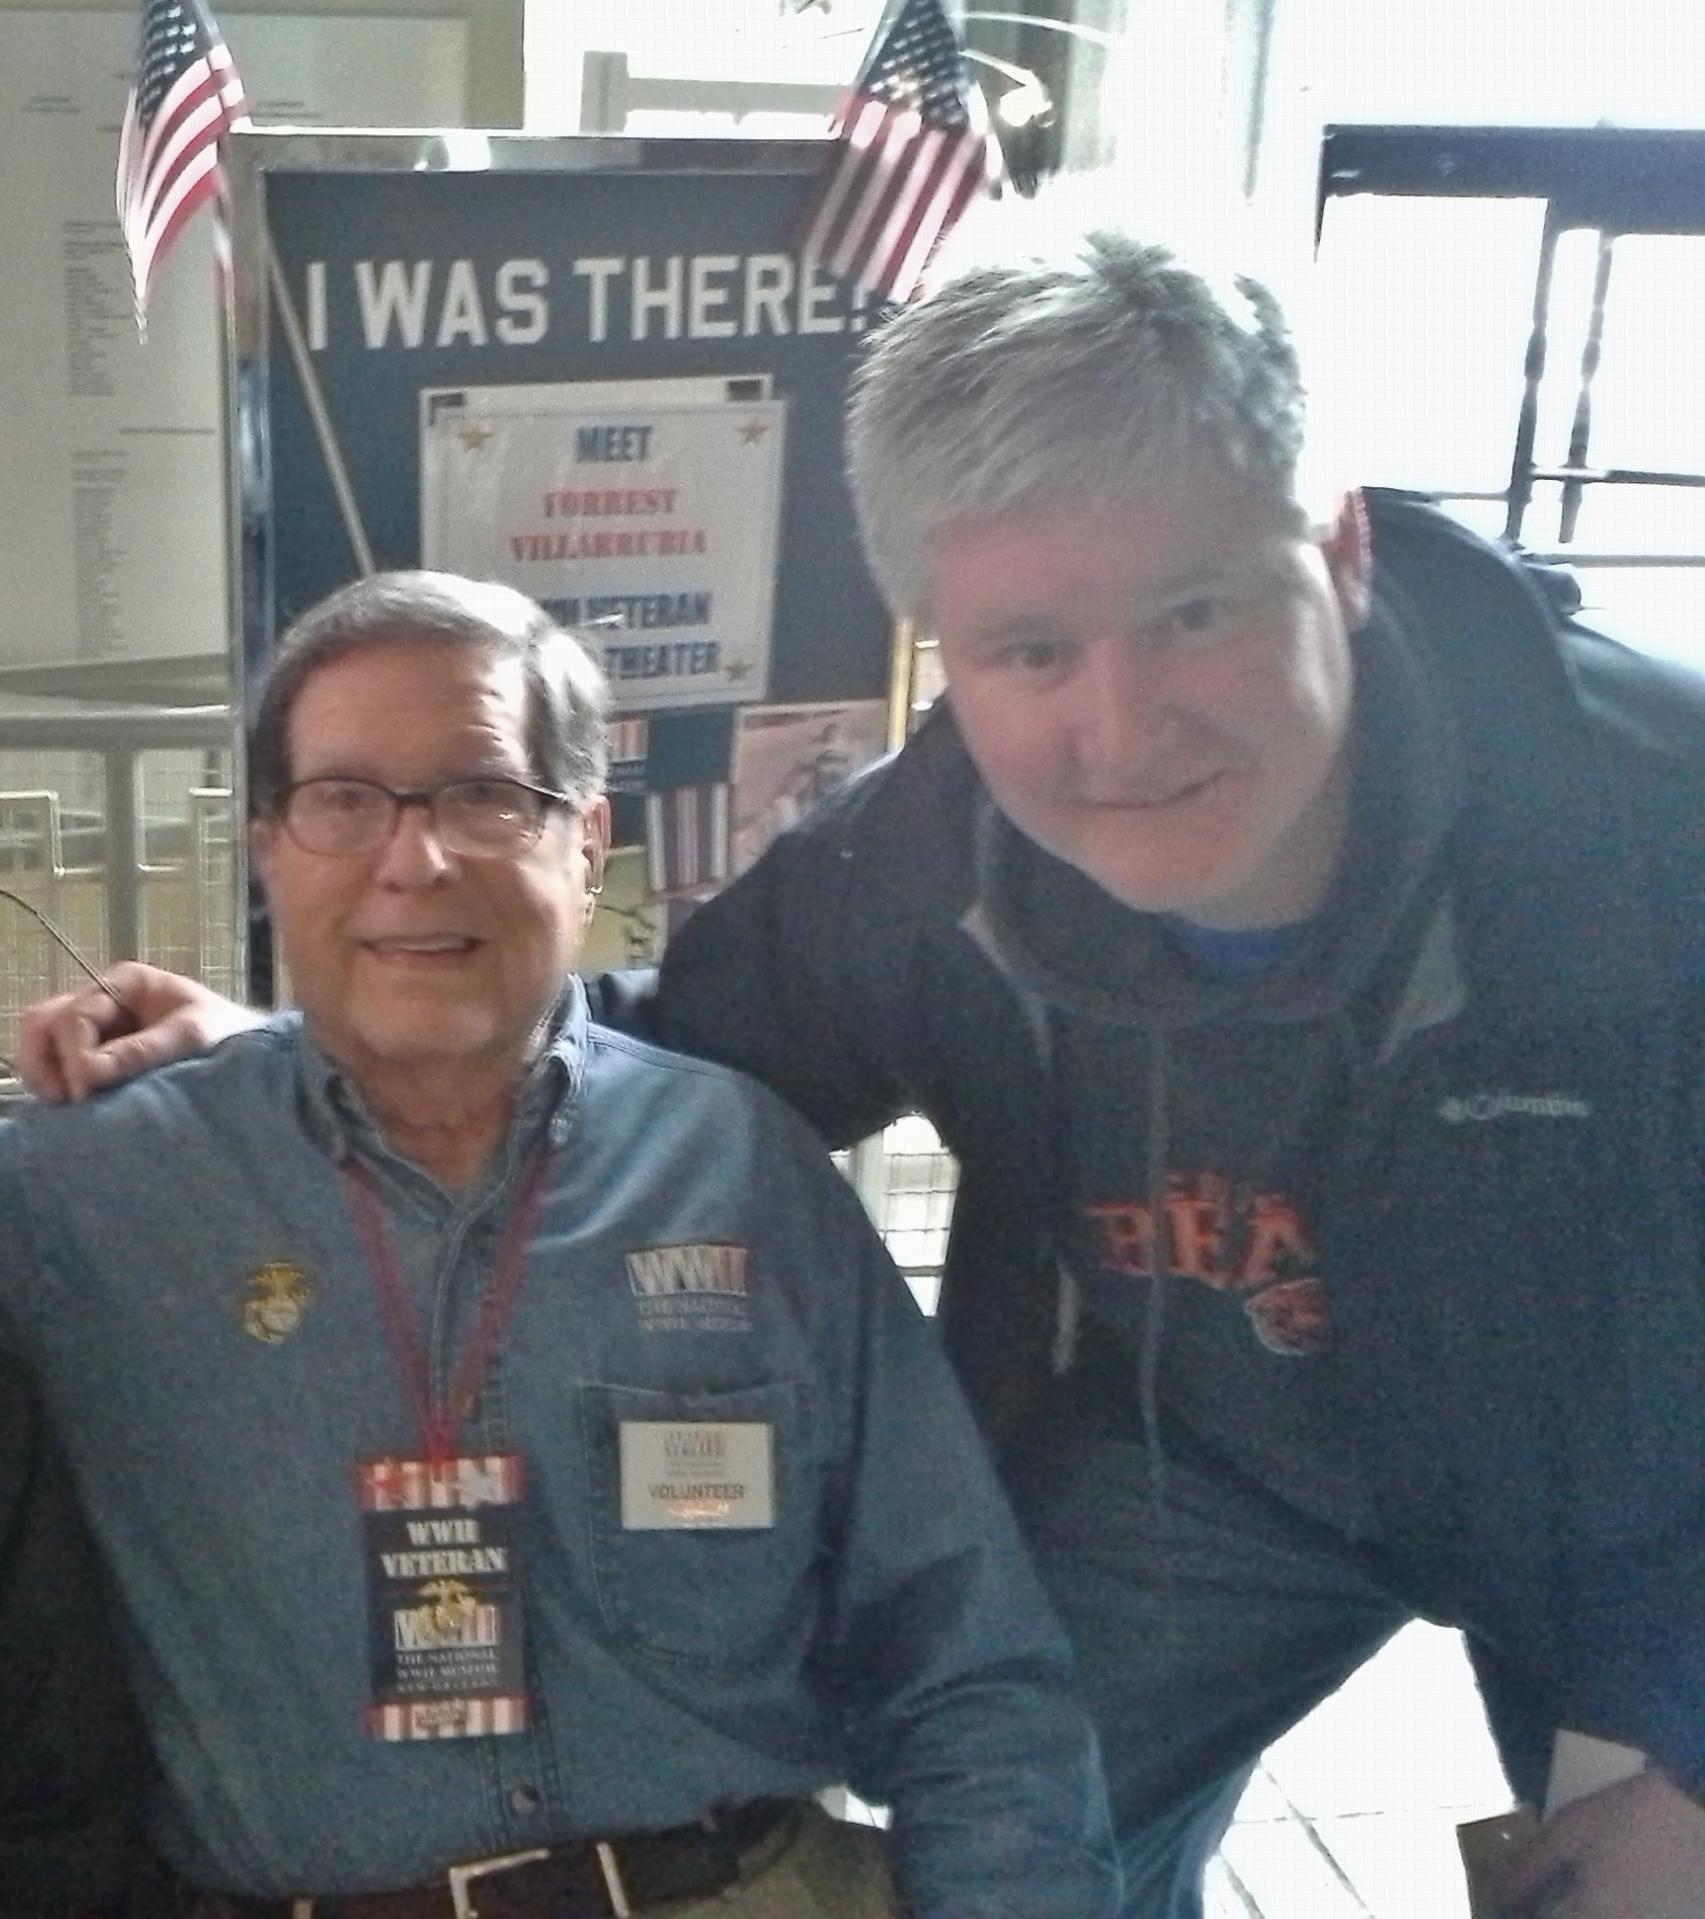 Forrest Villarrubia (US Marine Corp Veteran) with my friend, Bob Murphy, whose Dad ( Timothy Joseph Murphy JR. US Navy Veteran - RIP) served on a Landing Ship Transport (LST's) during D-Day.